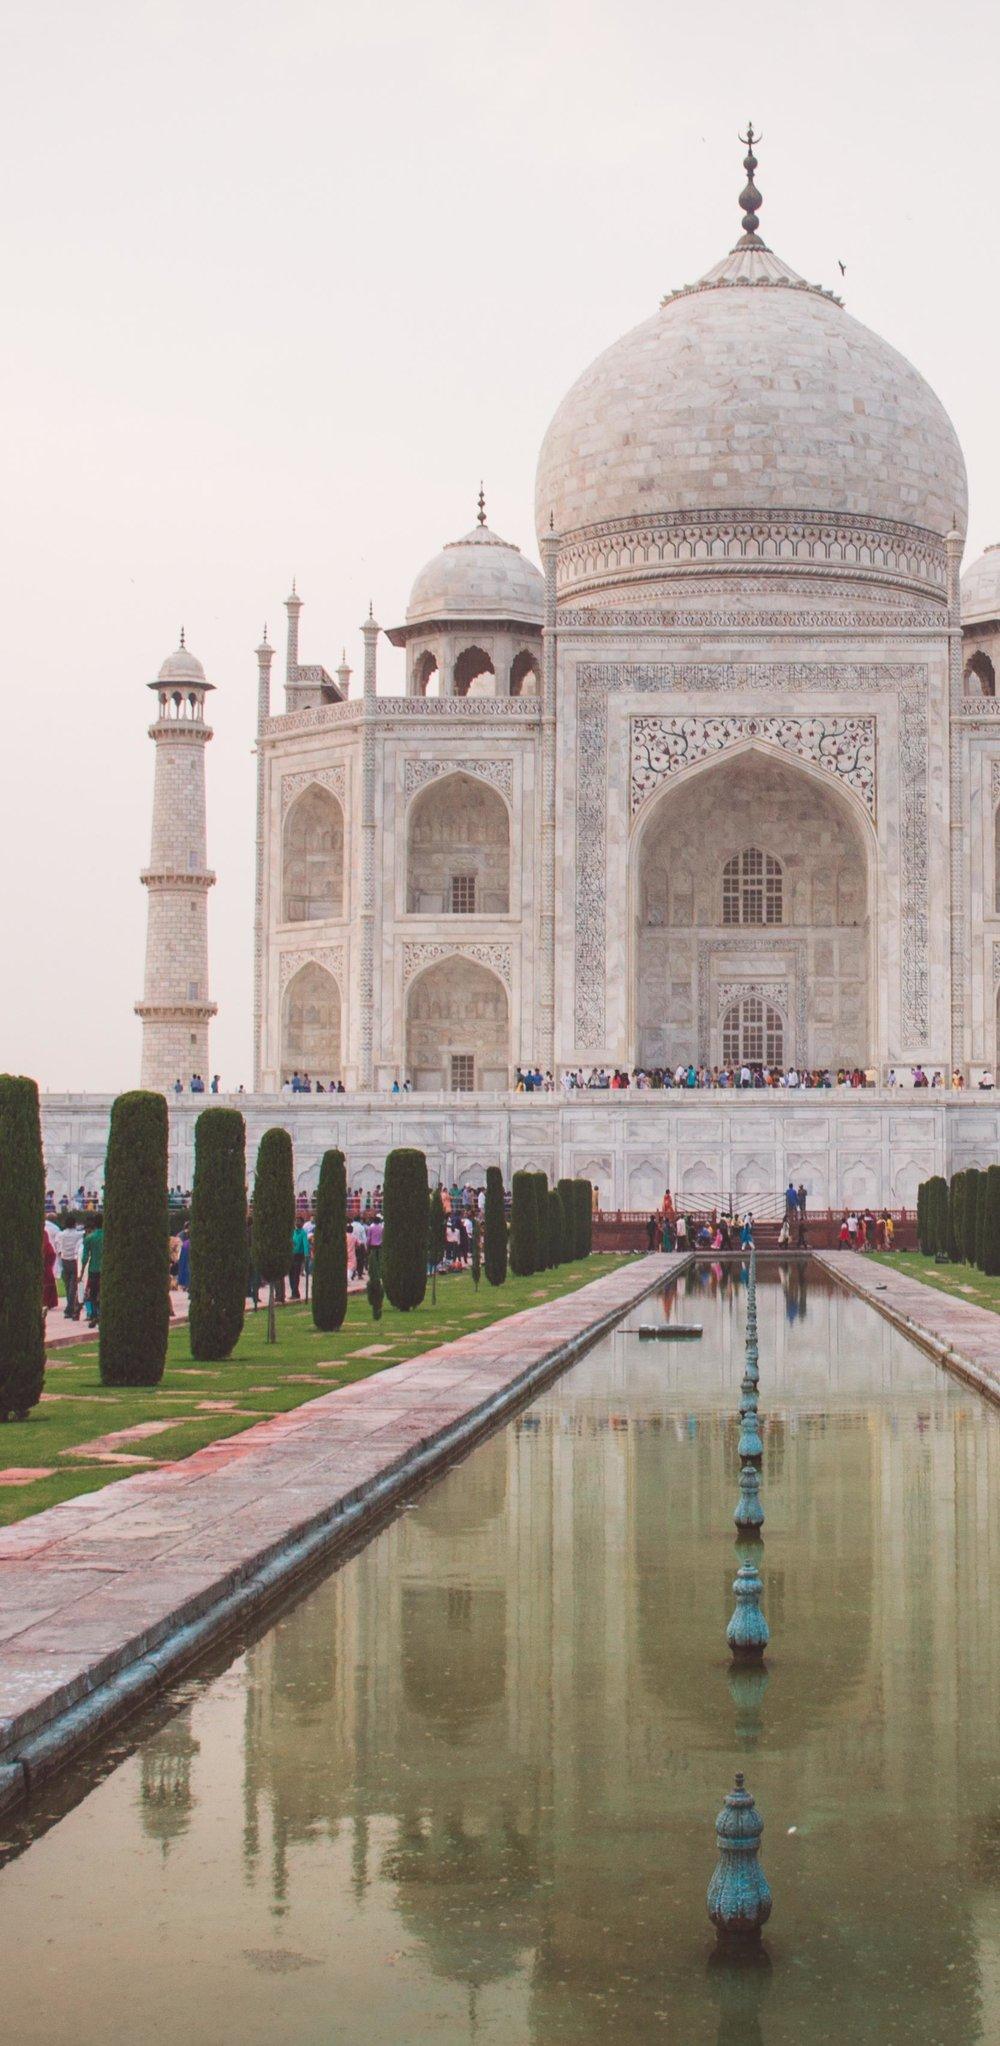 Taj Mahal cropped pixabay CCO license